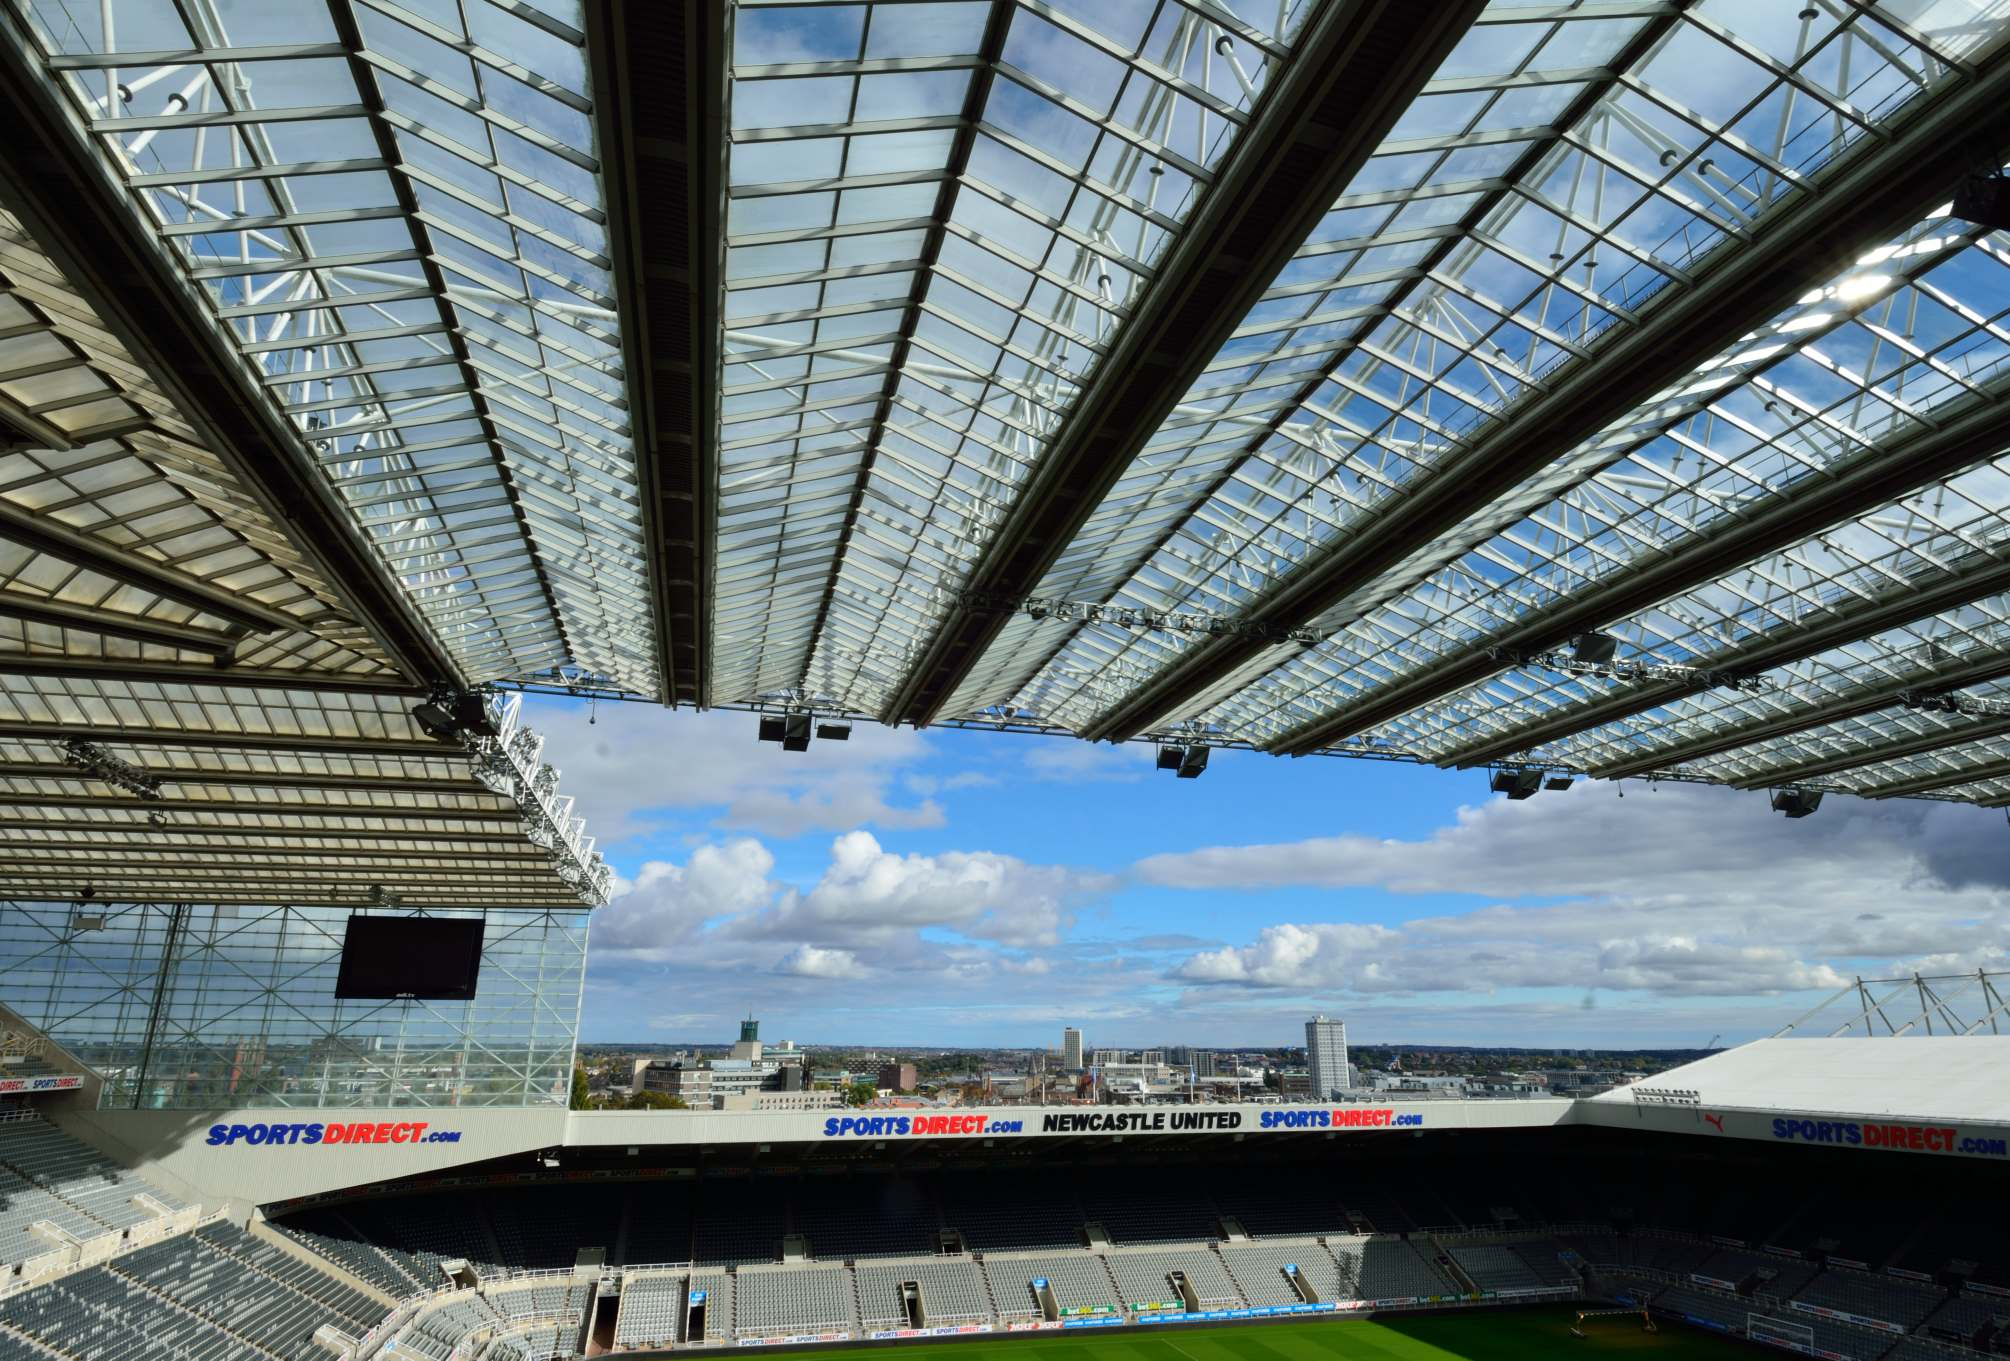 nufc tours2 Newcastle United Stadium Tours for Fans